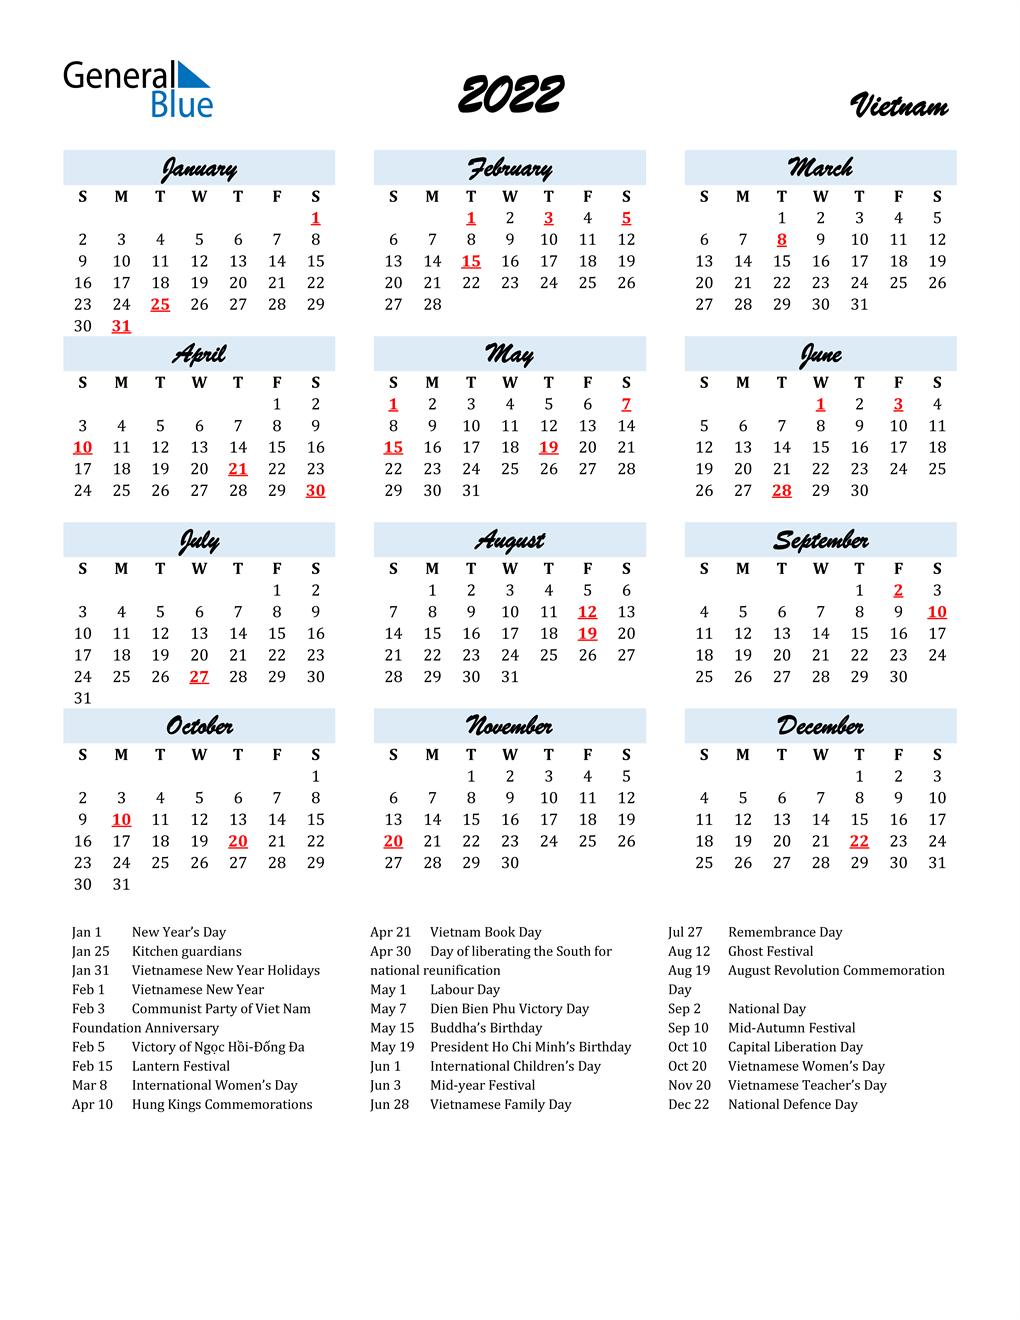 Vietnamese Calendar 2022.2022 Vietnam Calendar With Holidays